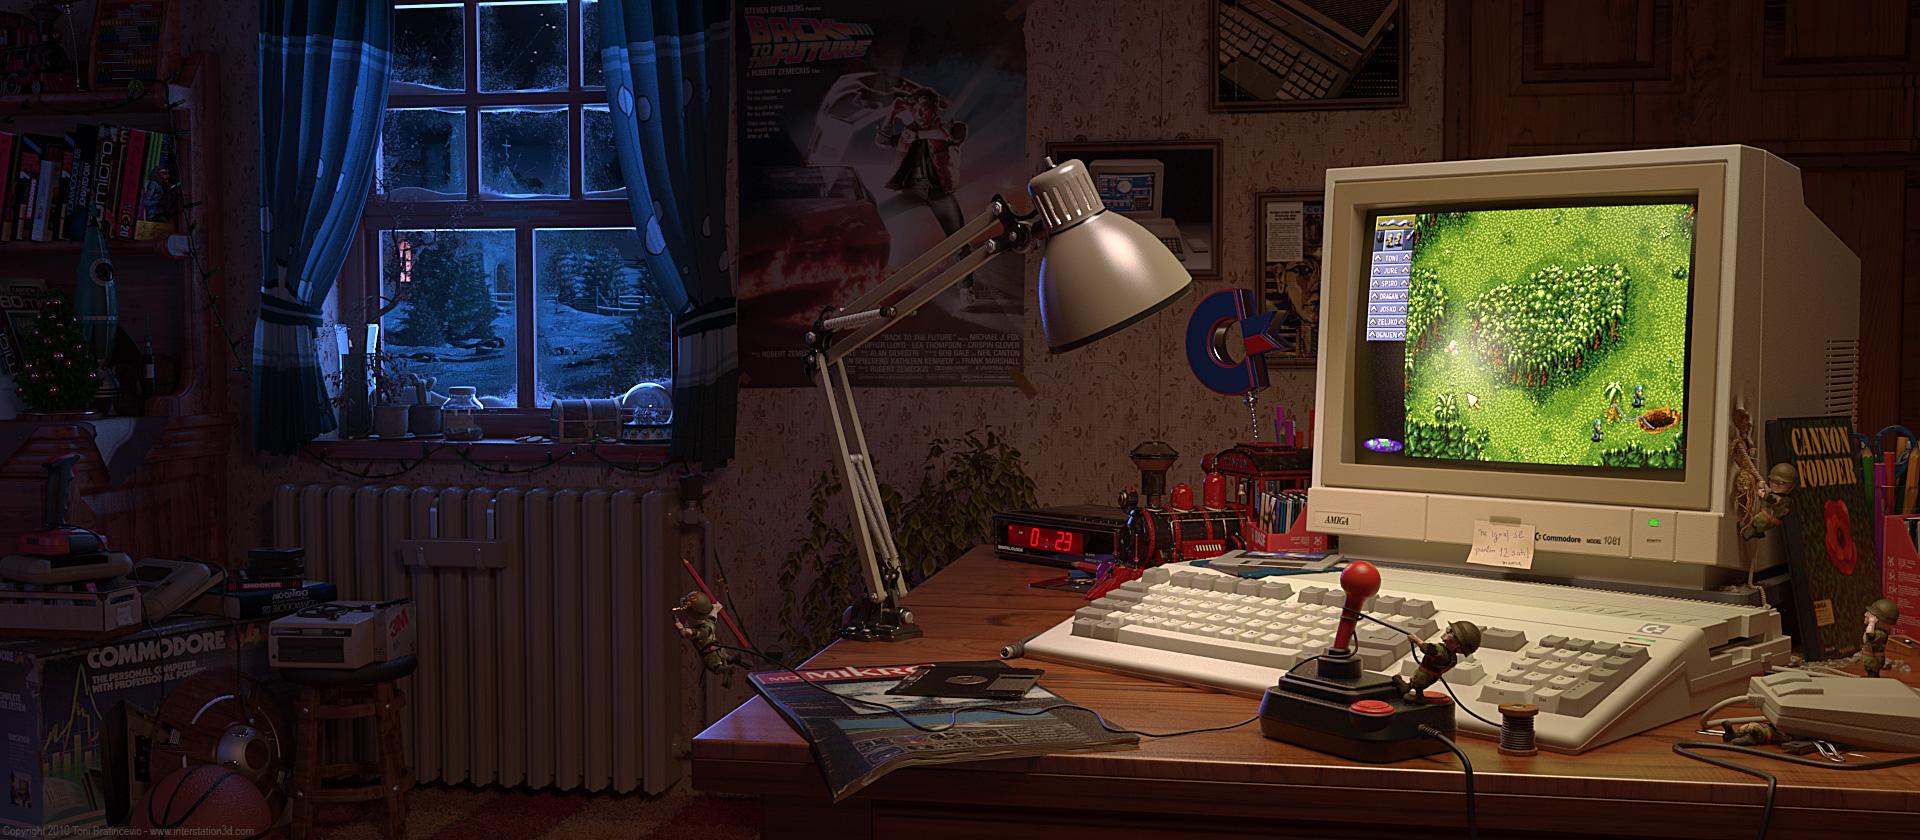 Amiga Cannon Fodder room